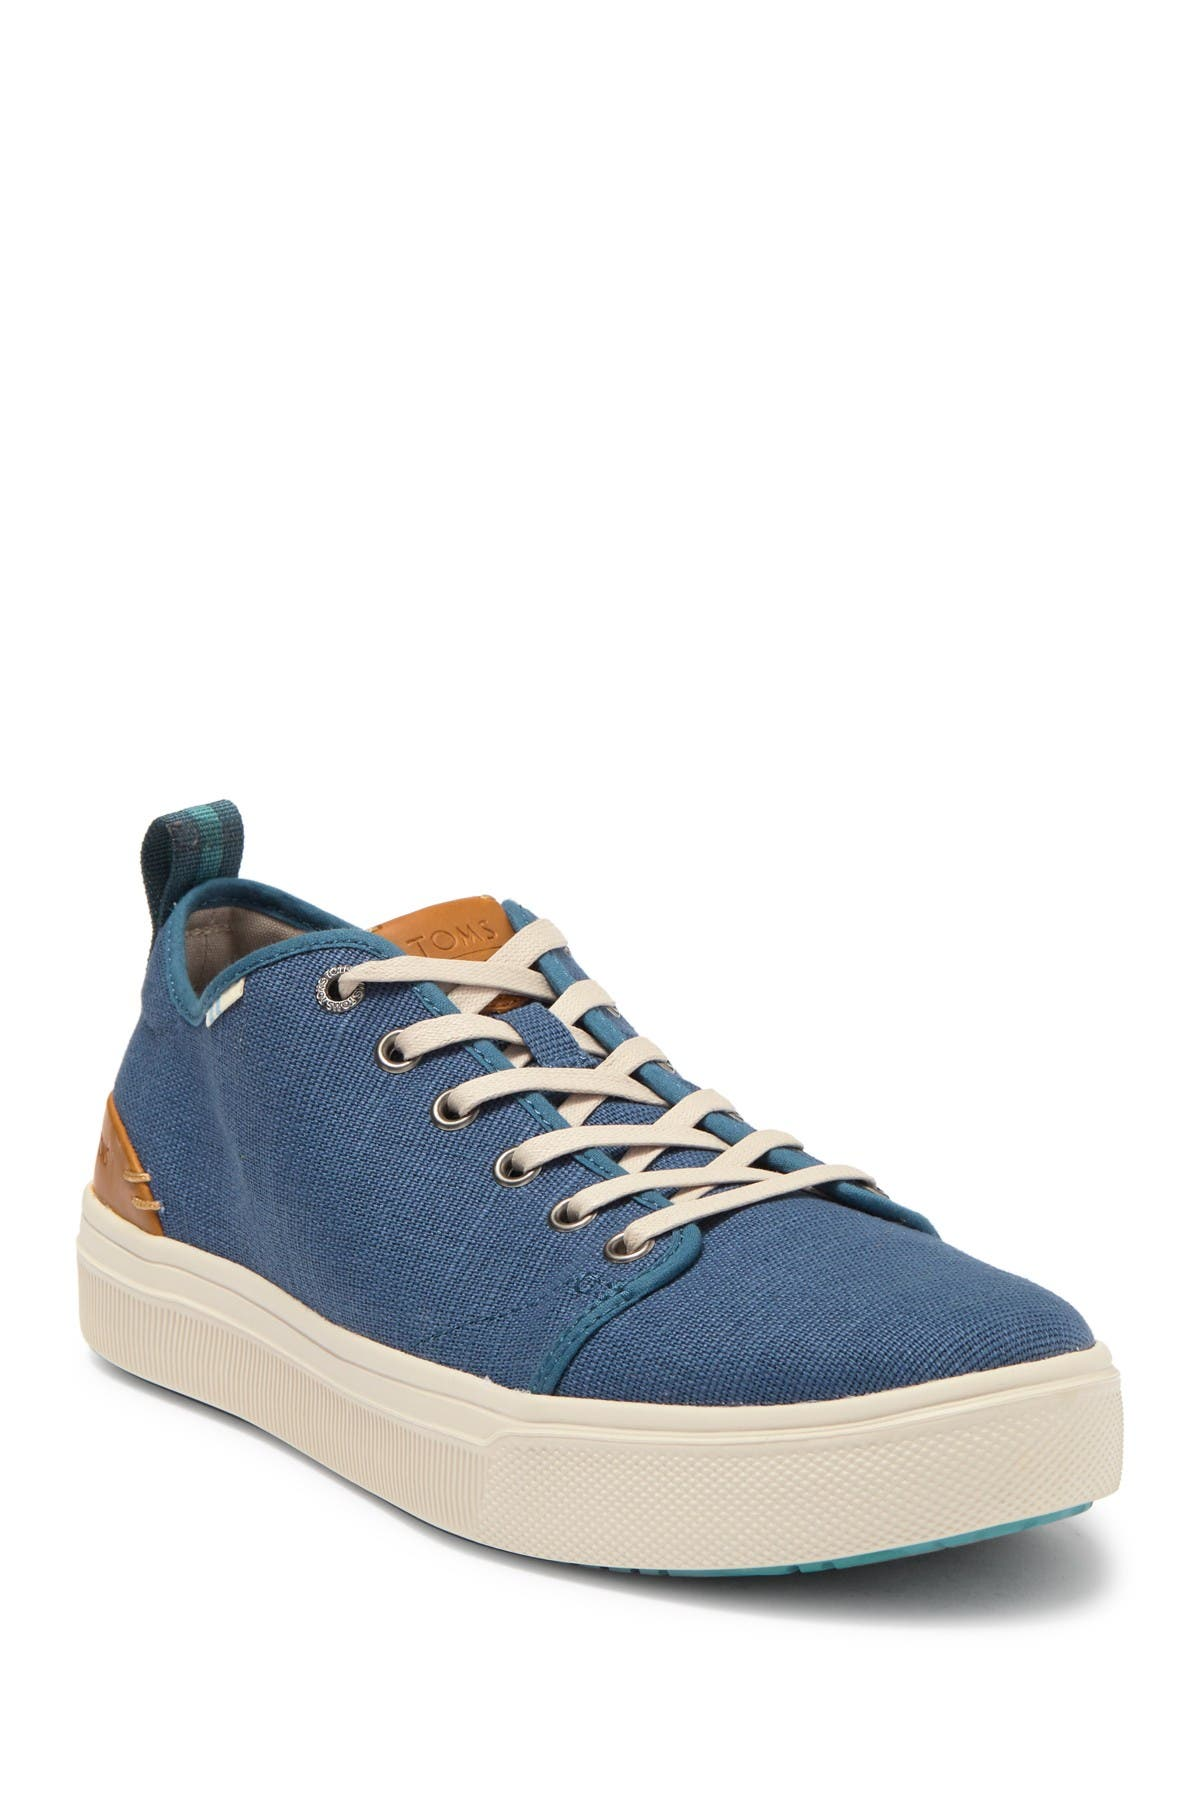 Image of TOMS Travel Lite Low Sneaker